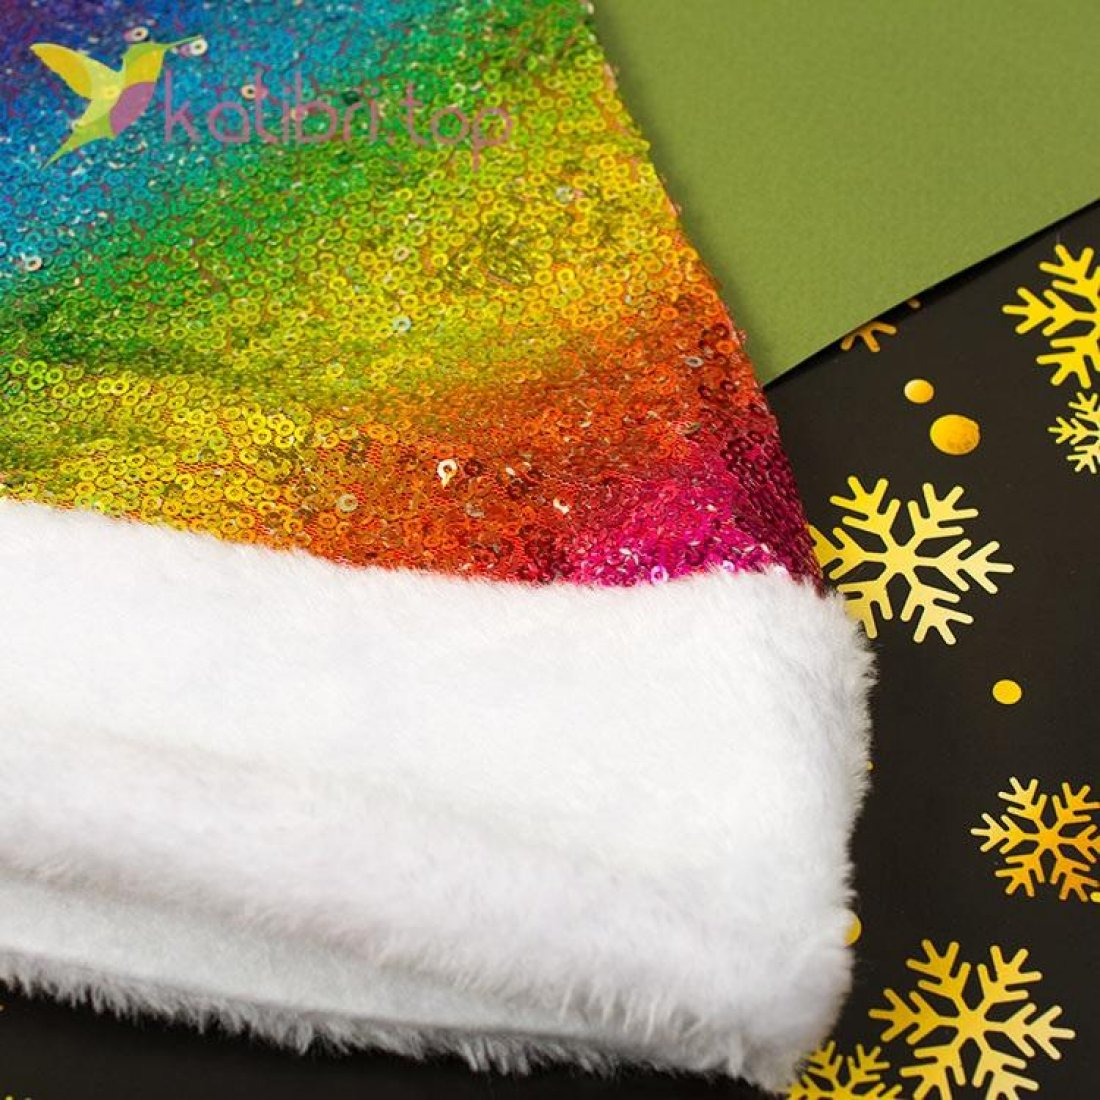 Новогодняя шапка Деда Мороза, оптом фото 2